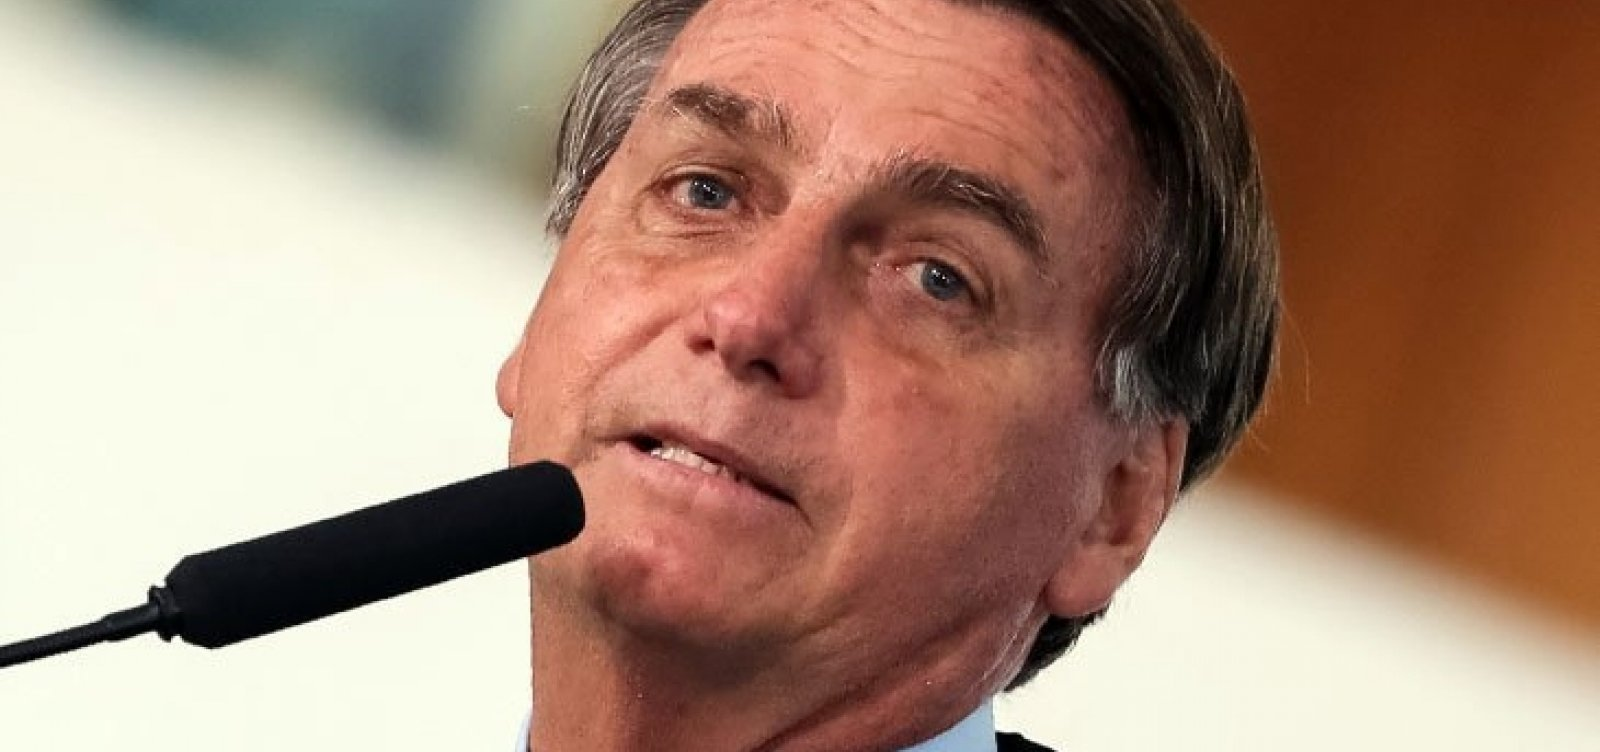 [Procuradoria do Tribunal Penal Internacional analisa denúncia contra Bolsonaro]